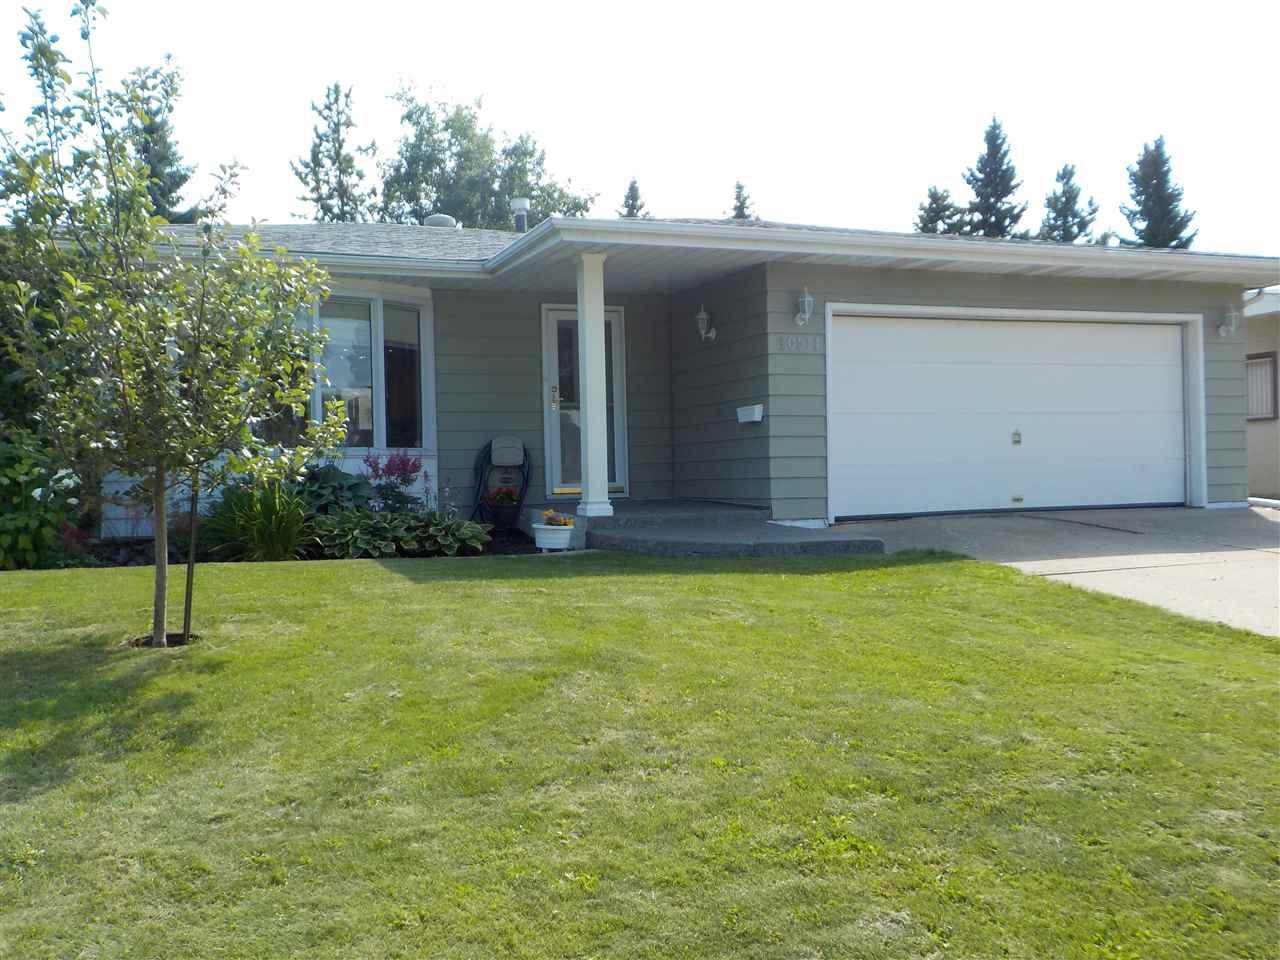 Main Photo: 10511 35 Avenue in Edmonton: Zone 16 House for sale : MLS®# E4208546